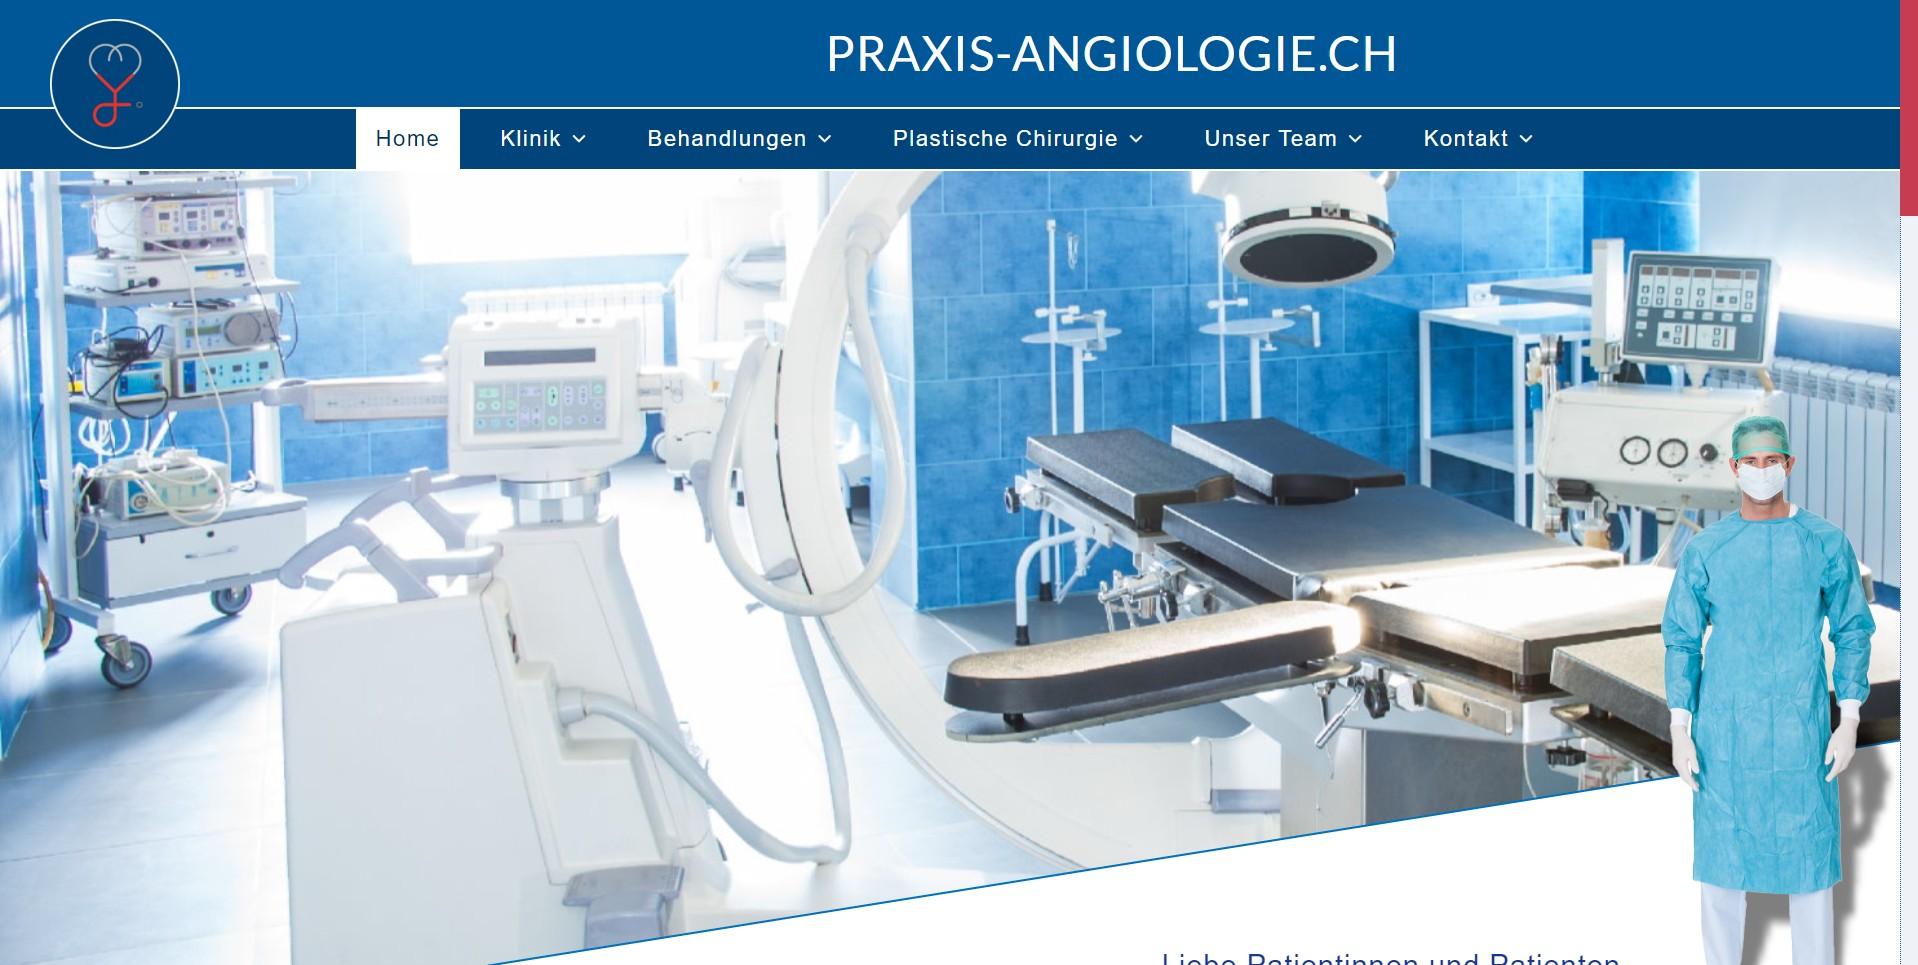 Praxis-Angiologie.ch